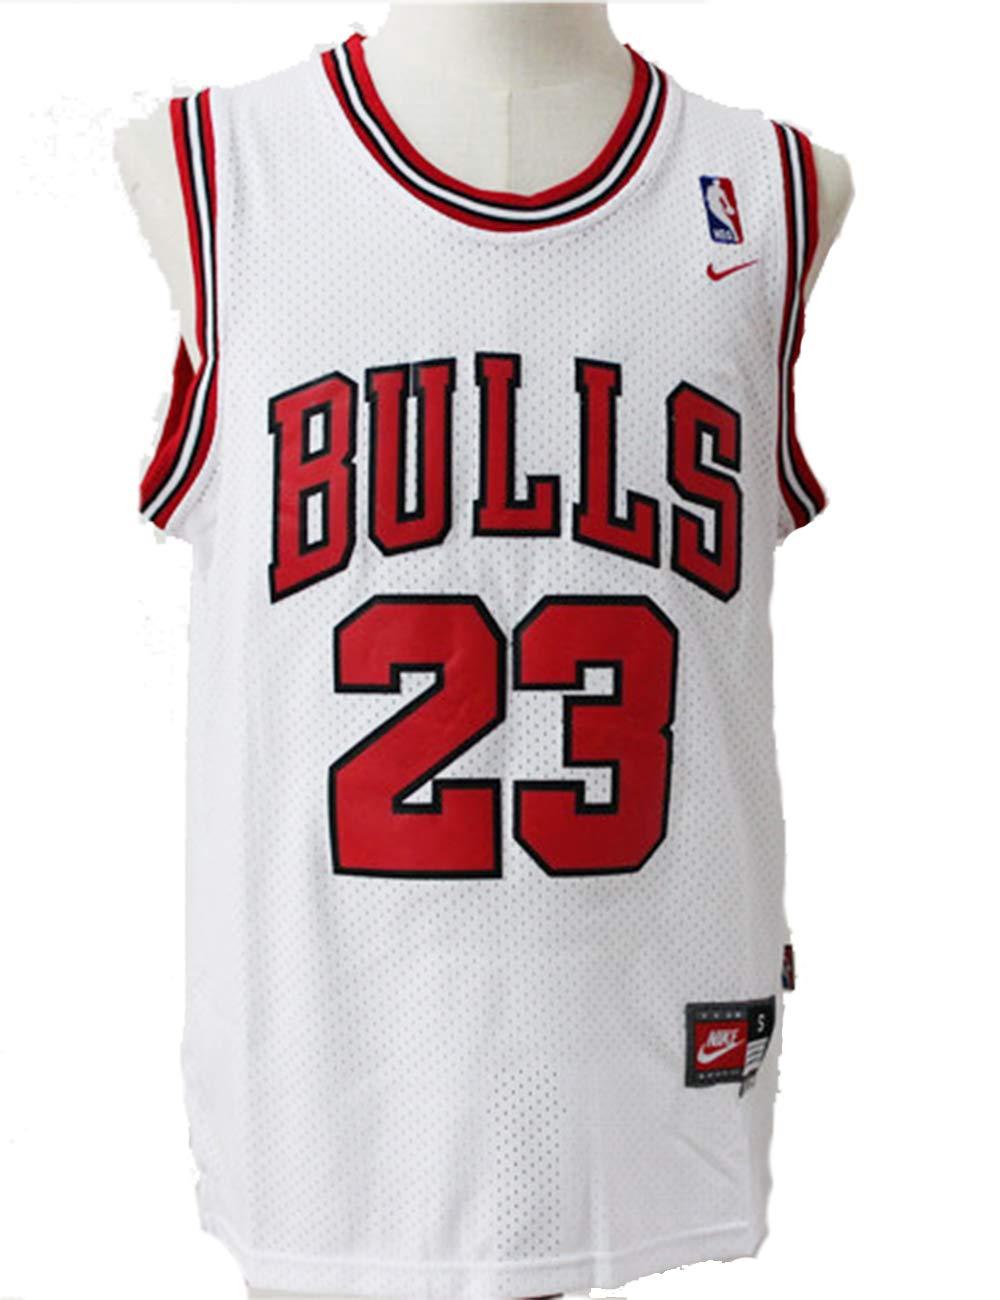 Chicago Bulls Michael Jordan #23 Retro Basketball Jersey